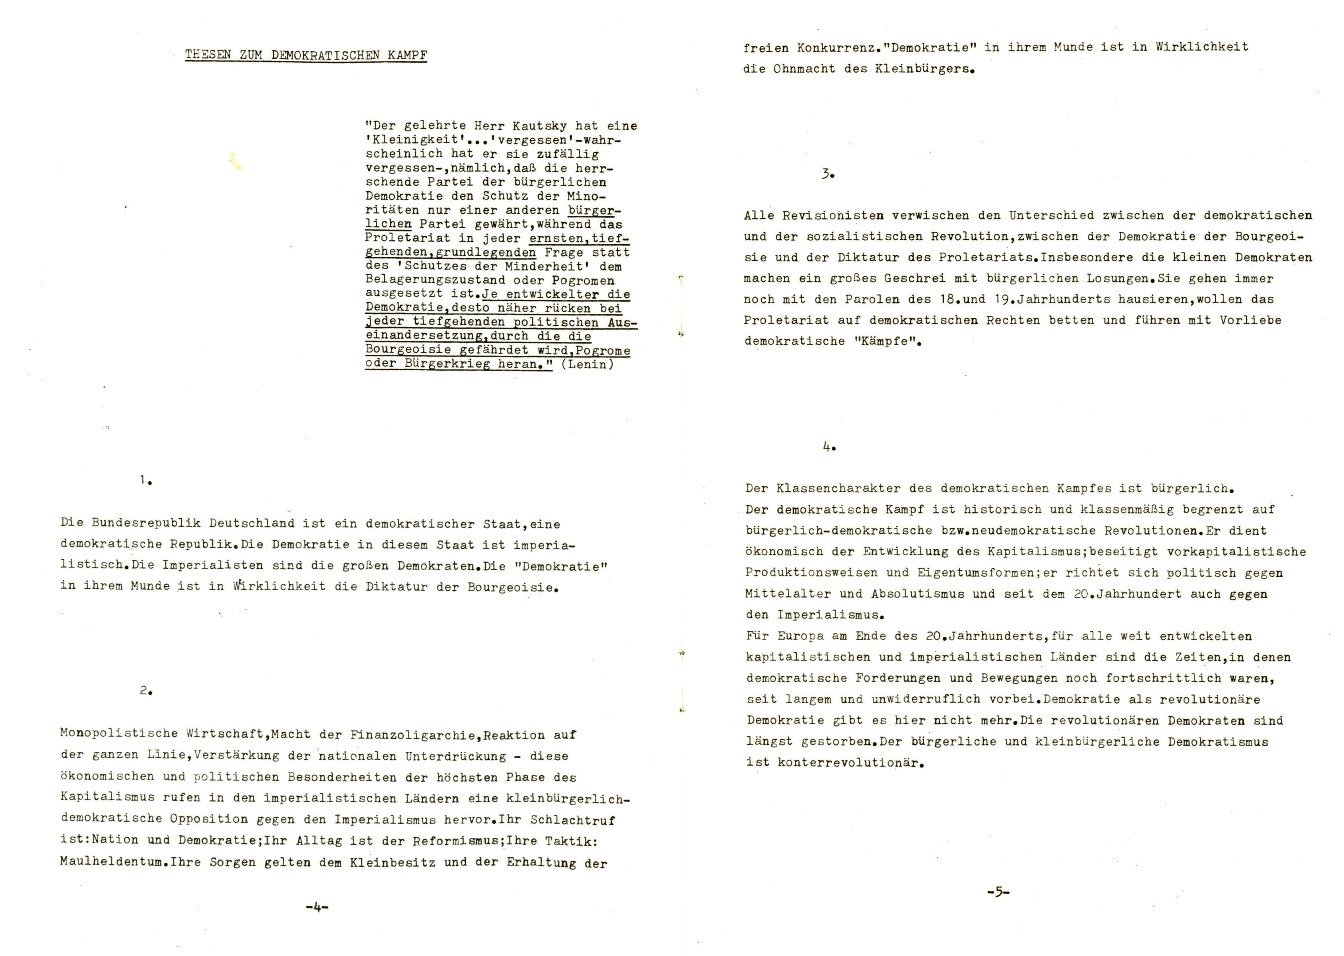 Muenchen_Kampf_dem_Revisionismus_1978_06_03